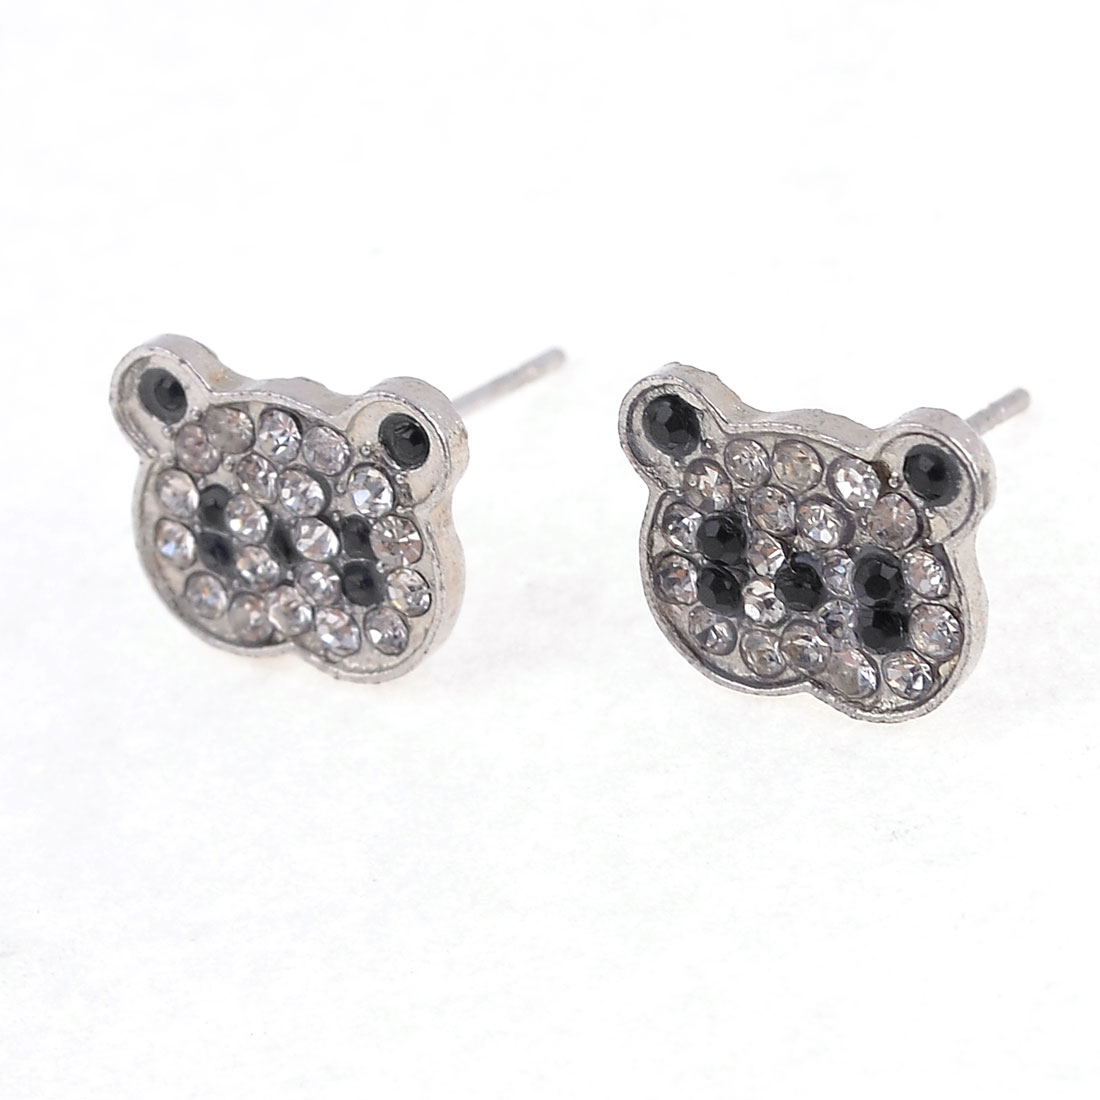 Lady Ear Ornament Rhinestone Inlaid Bear Stud Earrings Silver Tone 2Pcs